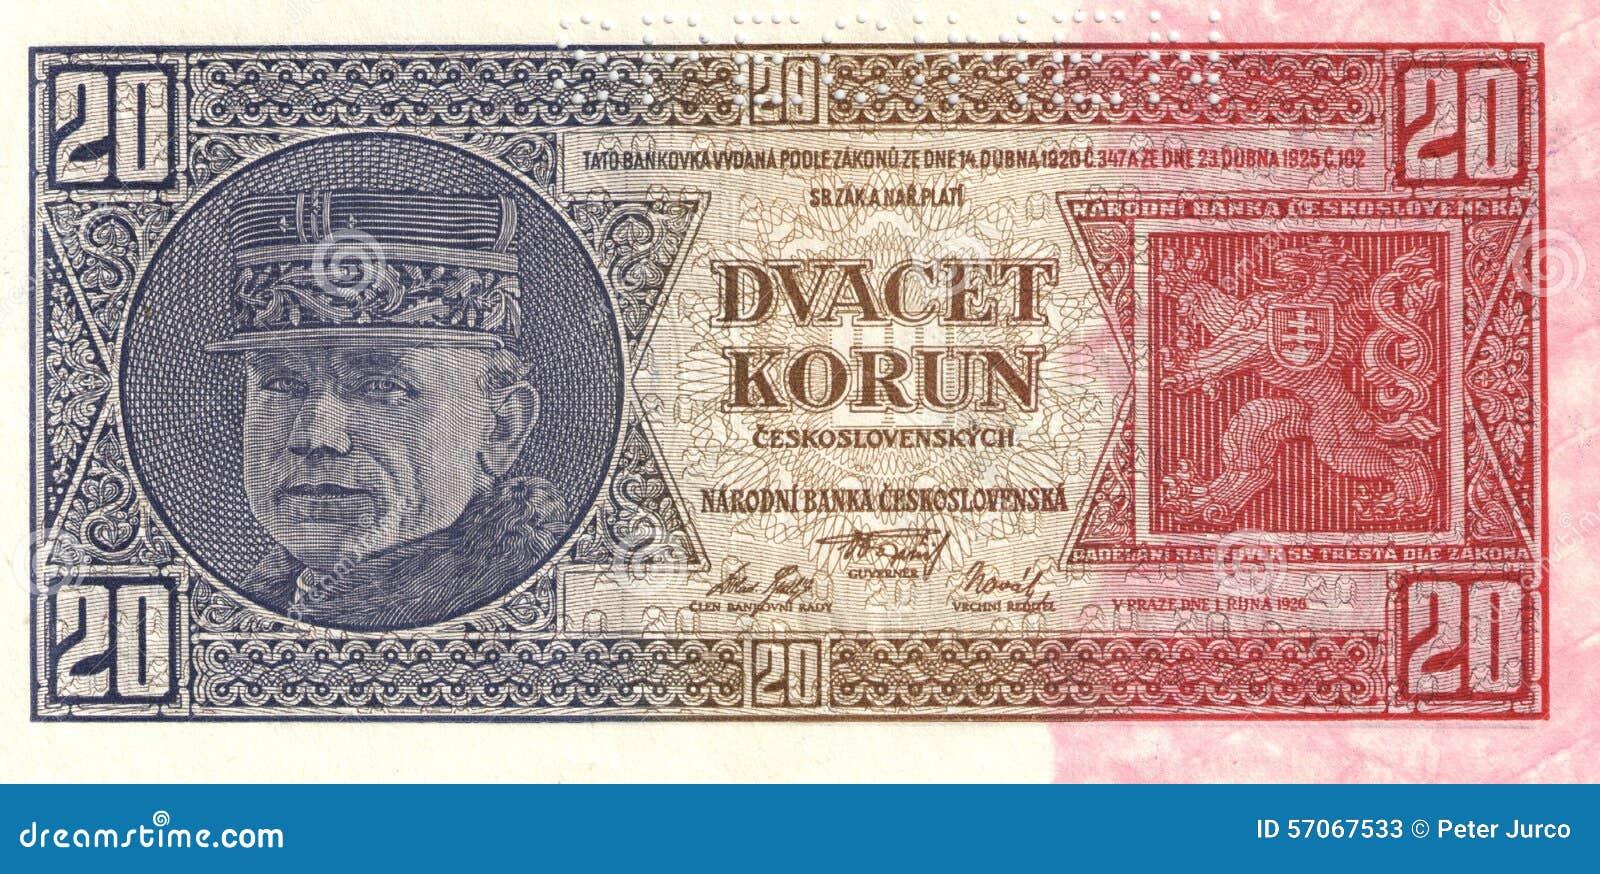 20 Korun - Bankbiljet